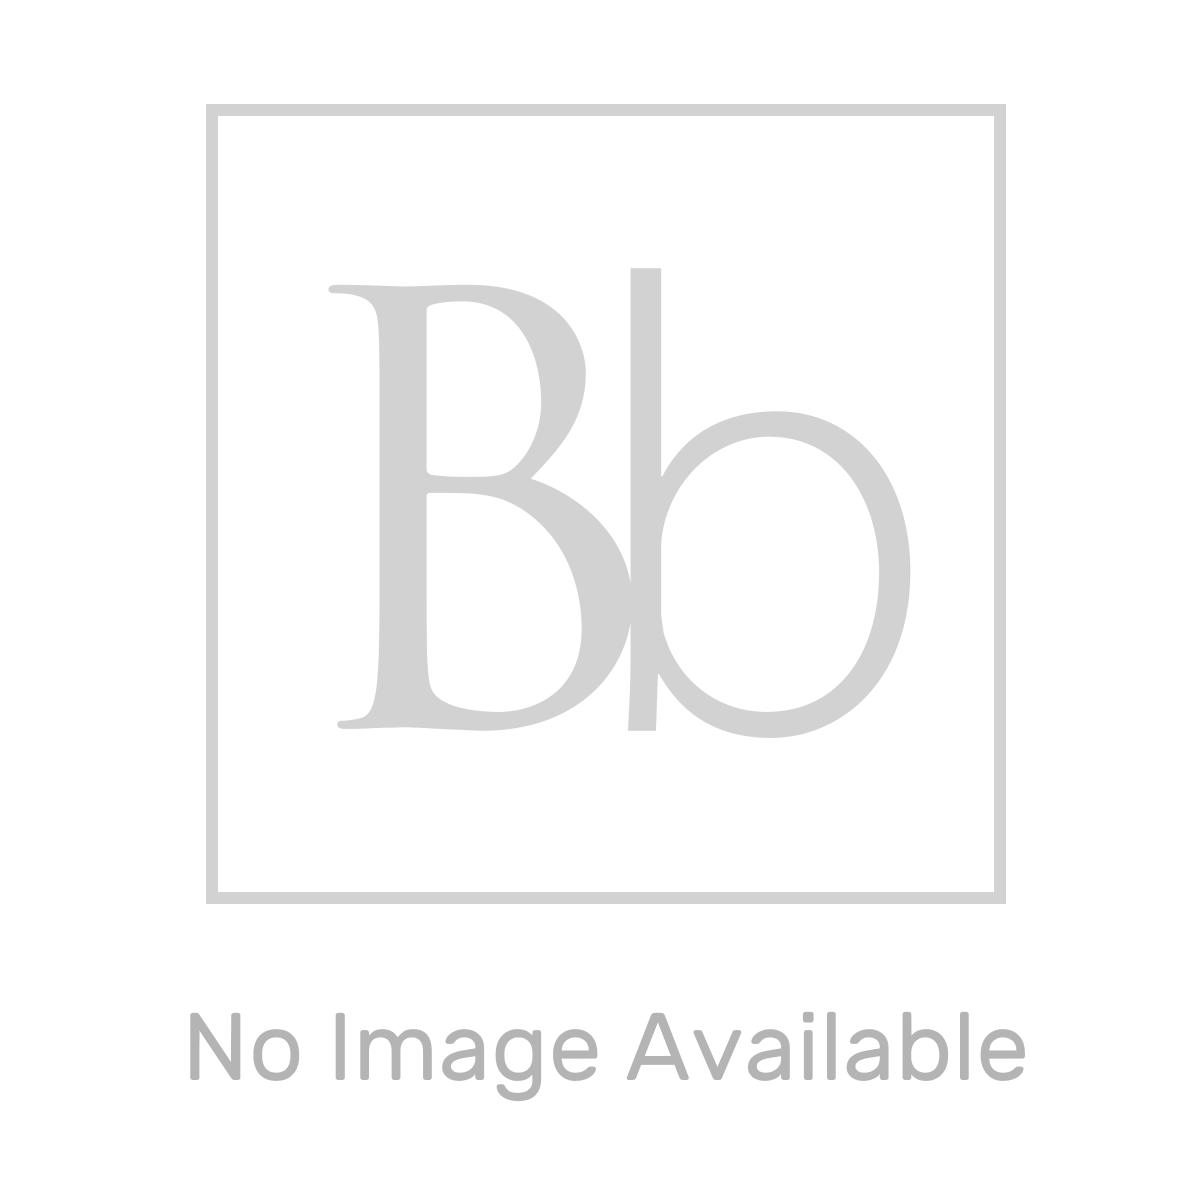 Croydex Unfold 'n' Fit Gloss White Bath End Panel 660mm